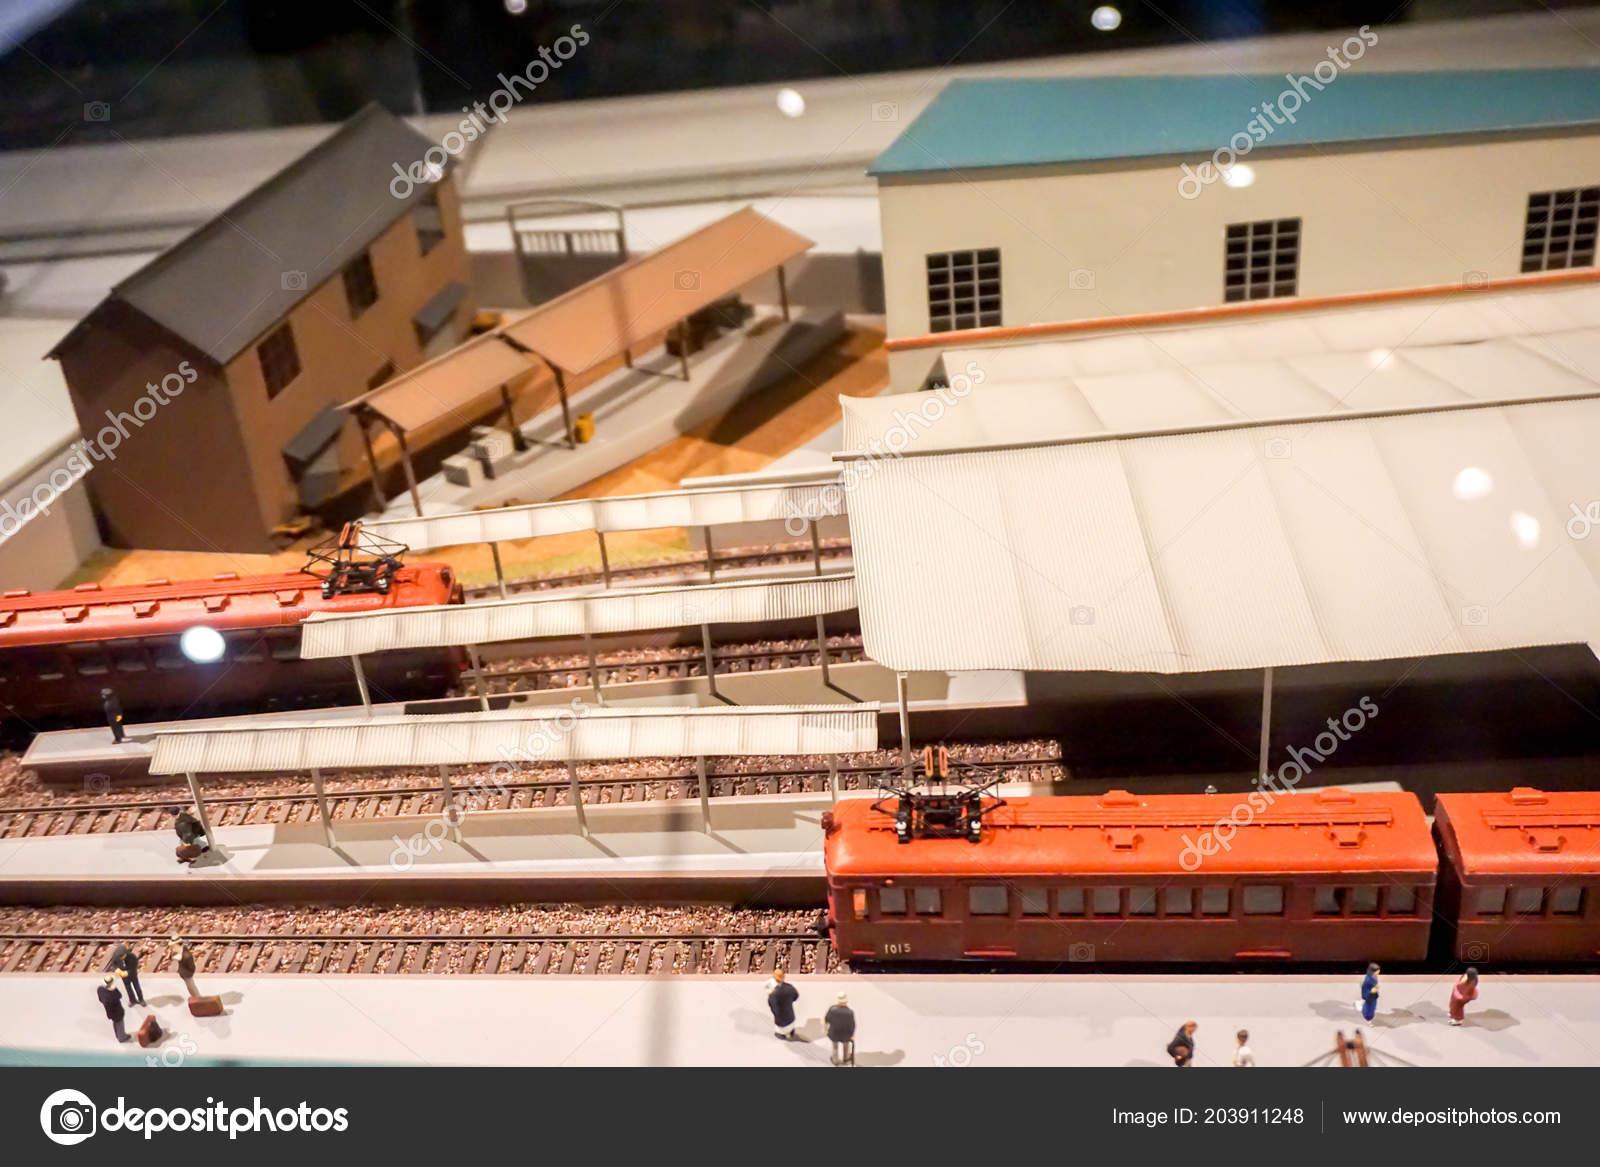 Osaka Japan February 2018 Miniature Model 1800 Ancient Train